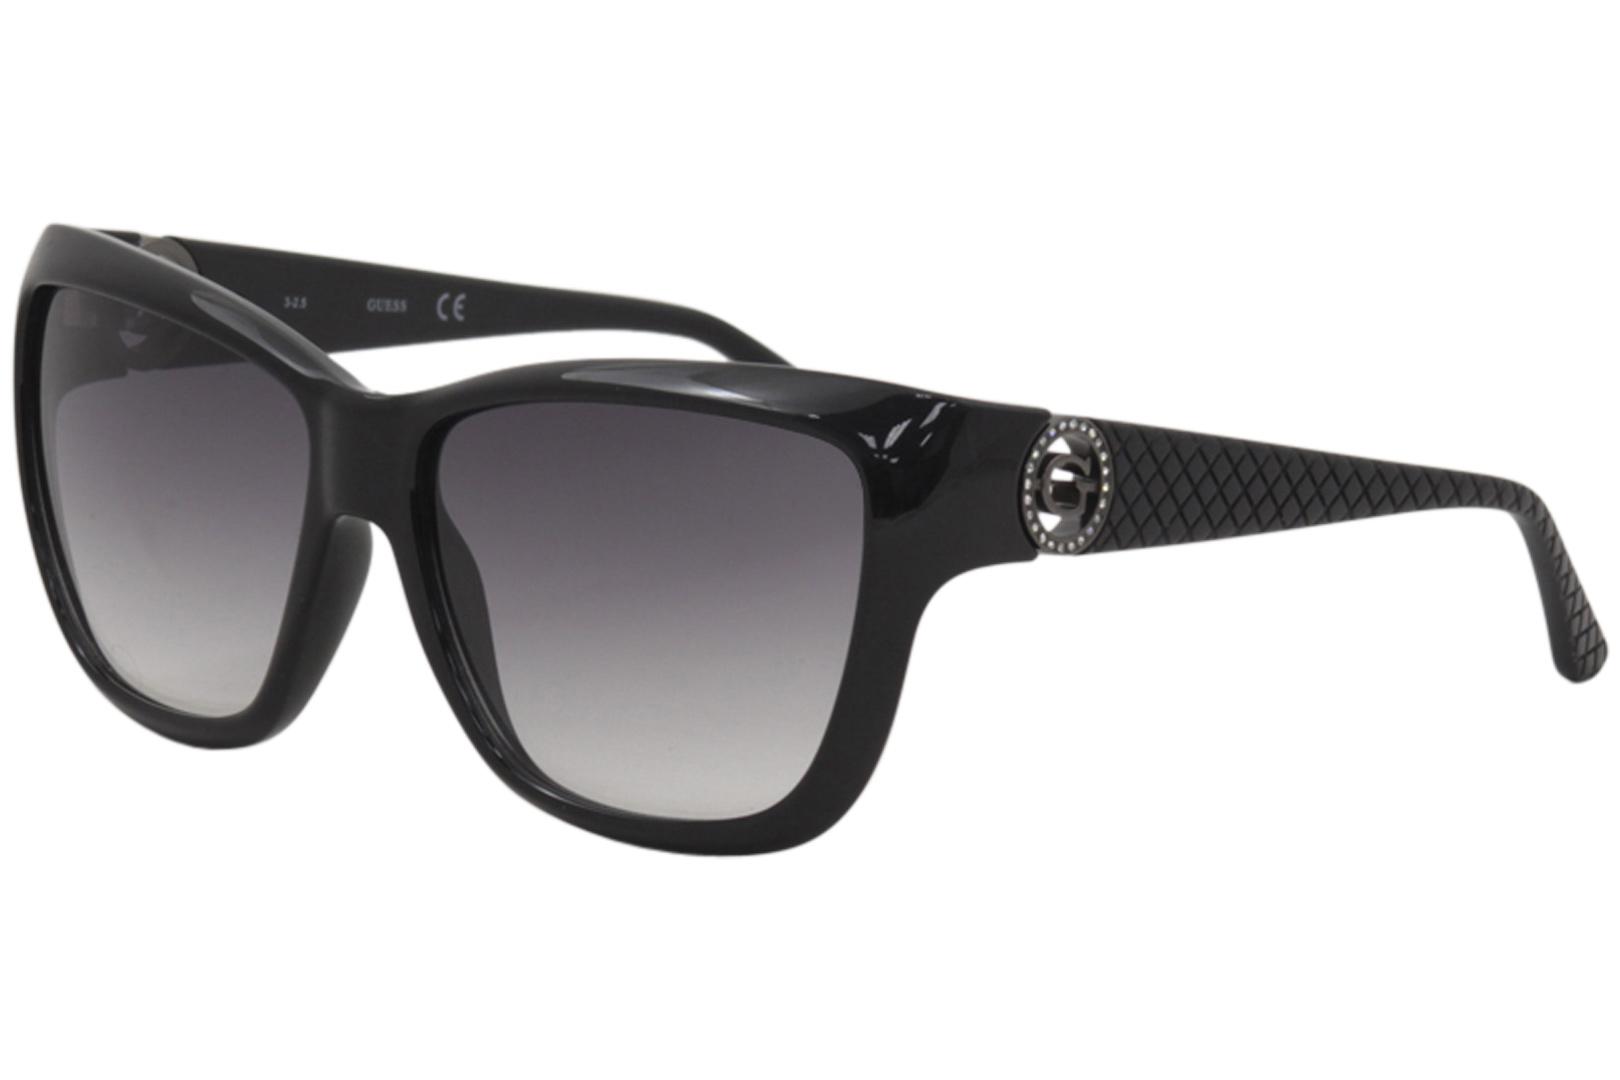 896d09cfd78 Guess Women s GU7374 GU 7374 BLK-35 Black Fashion Square Sunglasses 57mm